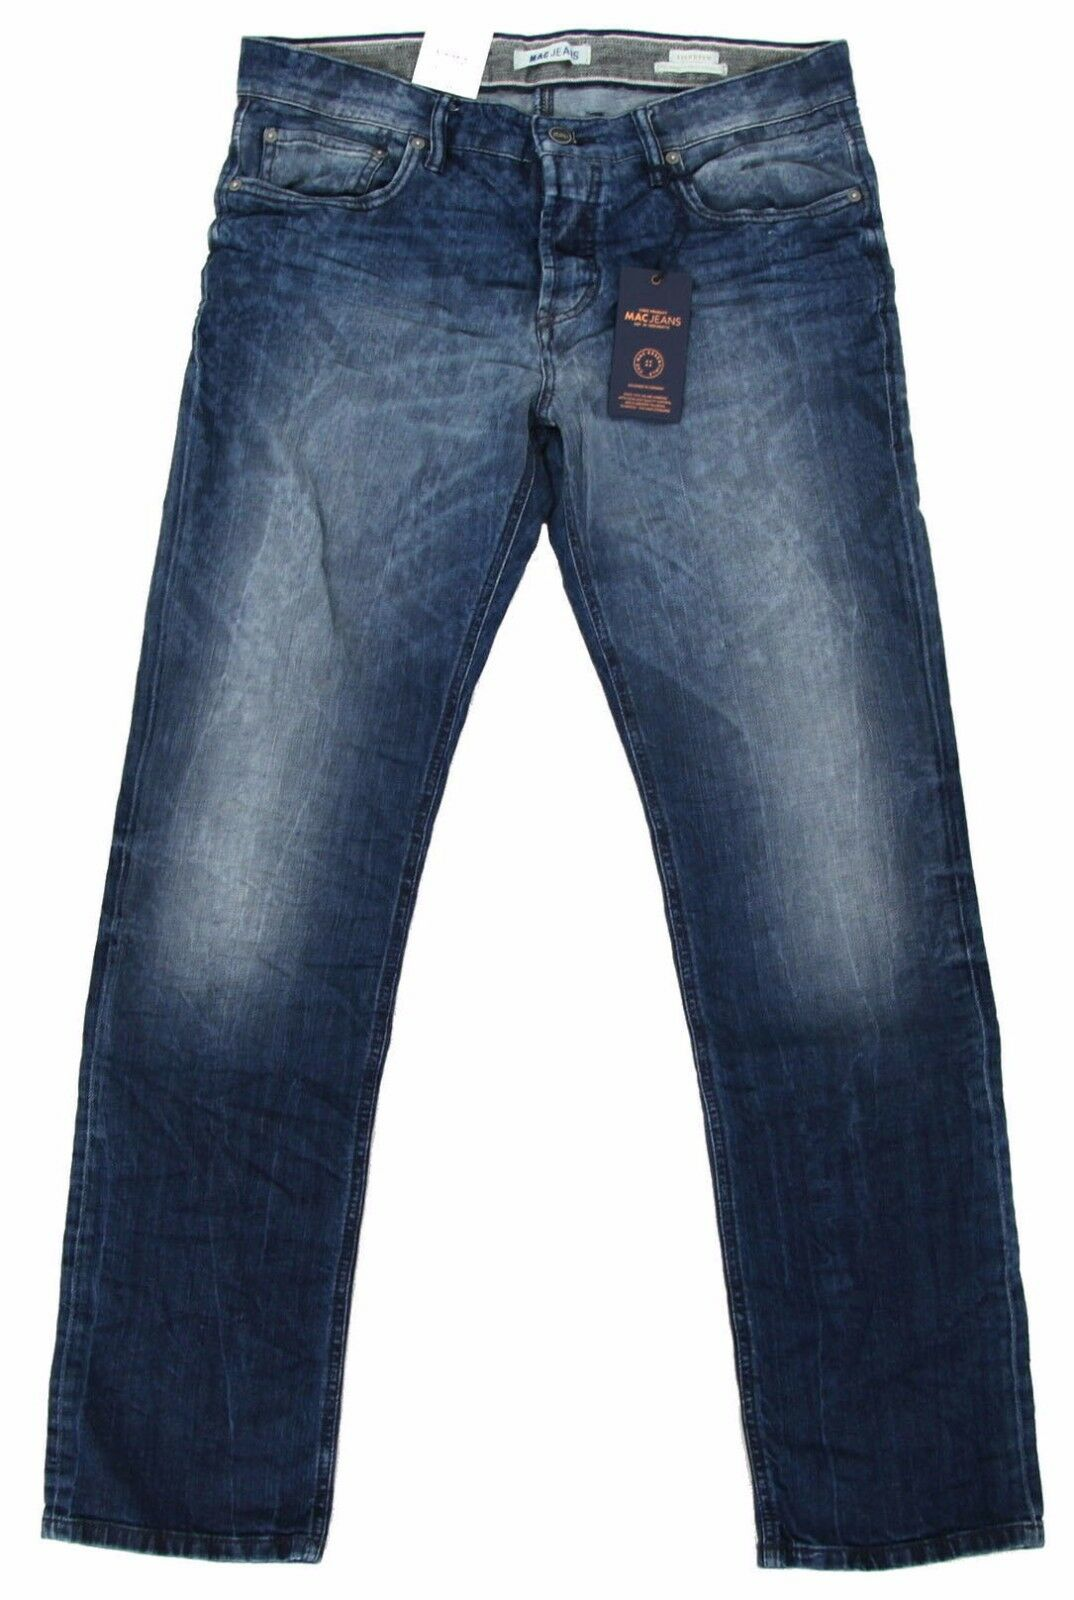 Mac Jeans Selected Arne Jeans Uomo Pantaloni Lang Uomo Uomo Uomo denim pants w33 l32 Stretch 9e54ed